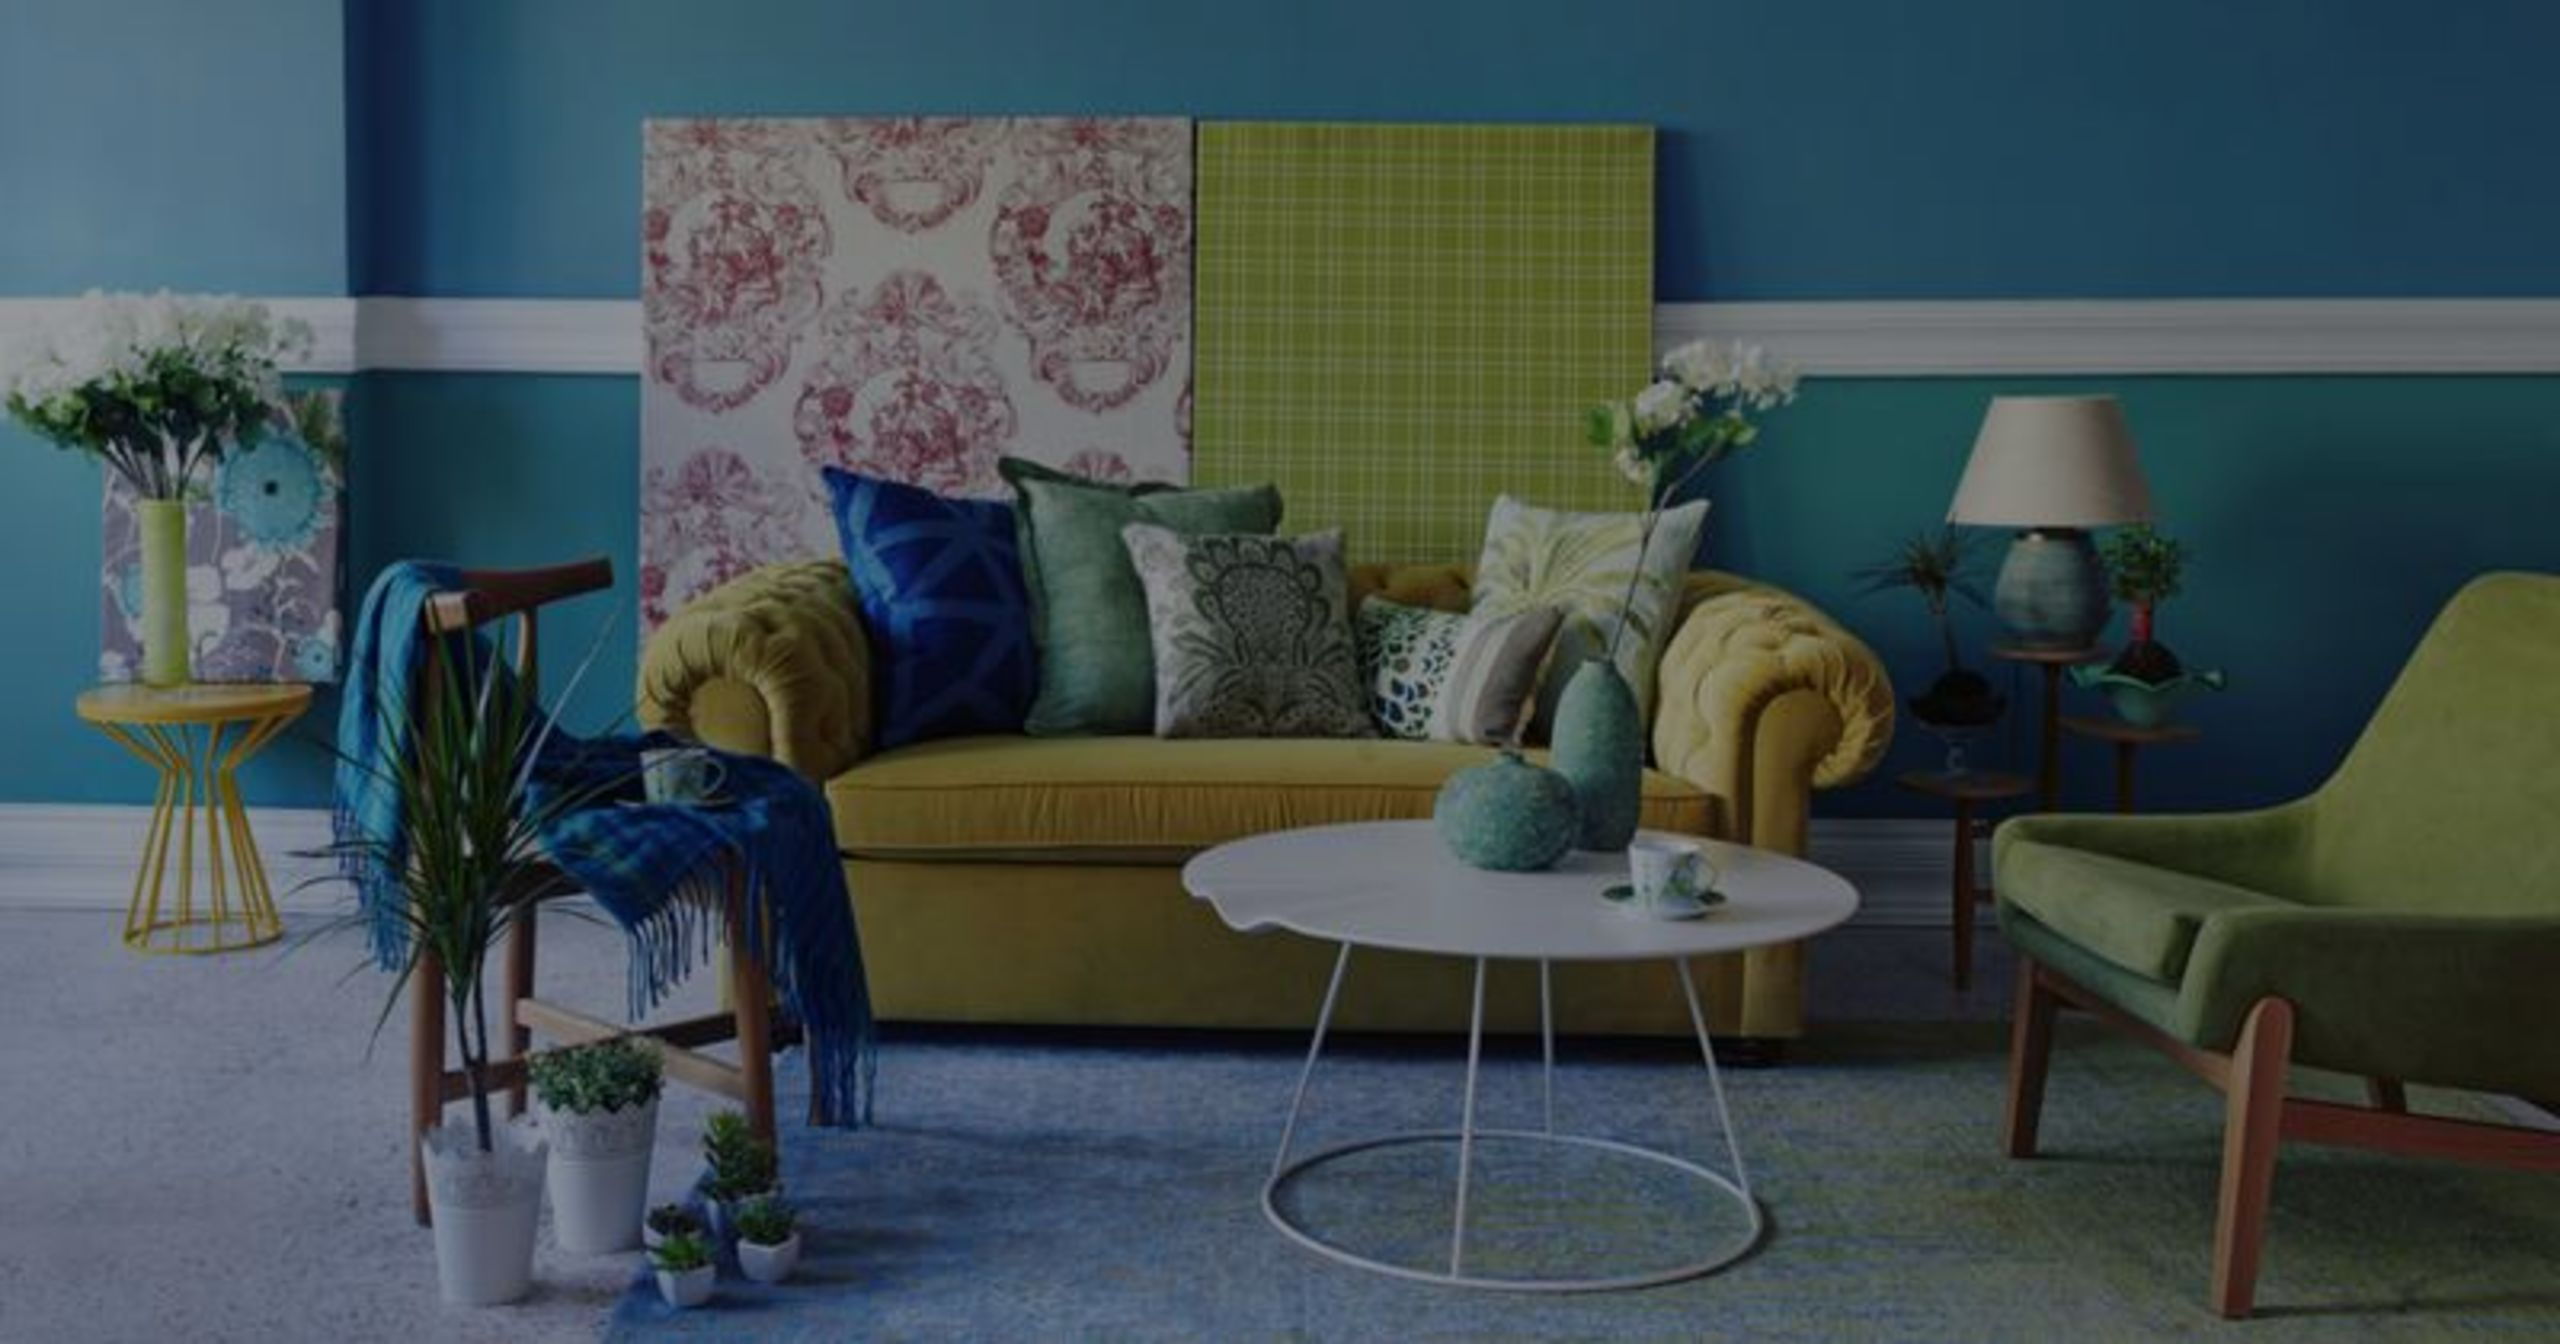 DESIGN TRENDS: HOME COLOR PALETTES FOR 2019